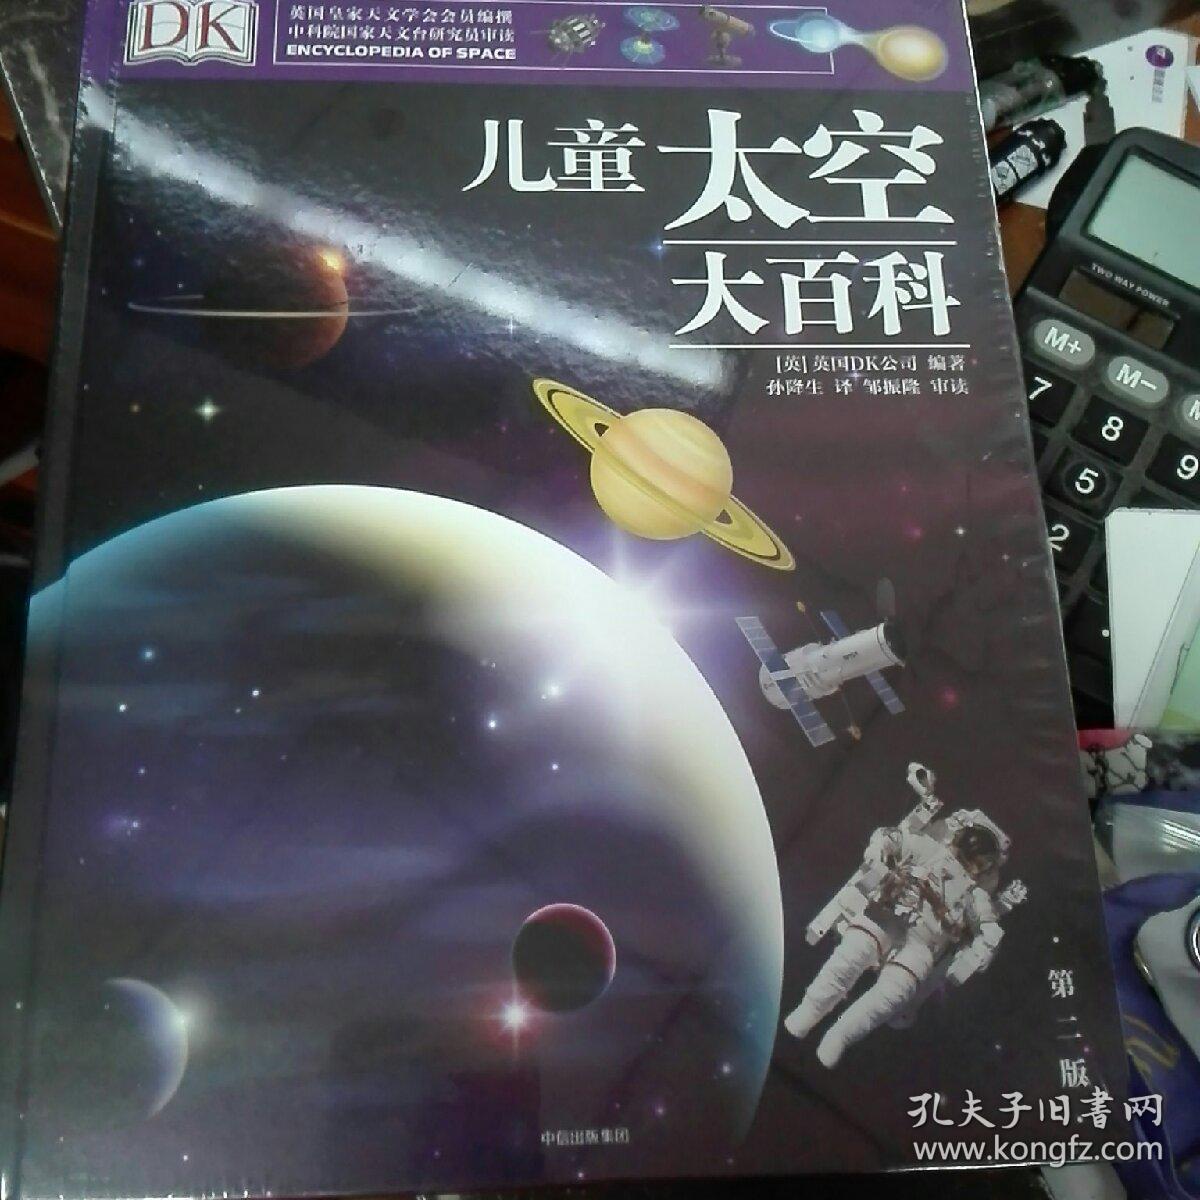 DK儿童太空大百科:孩子了解浩瀚太空的入门书(DK儿童大百科系列)